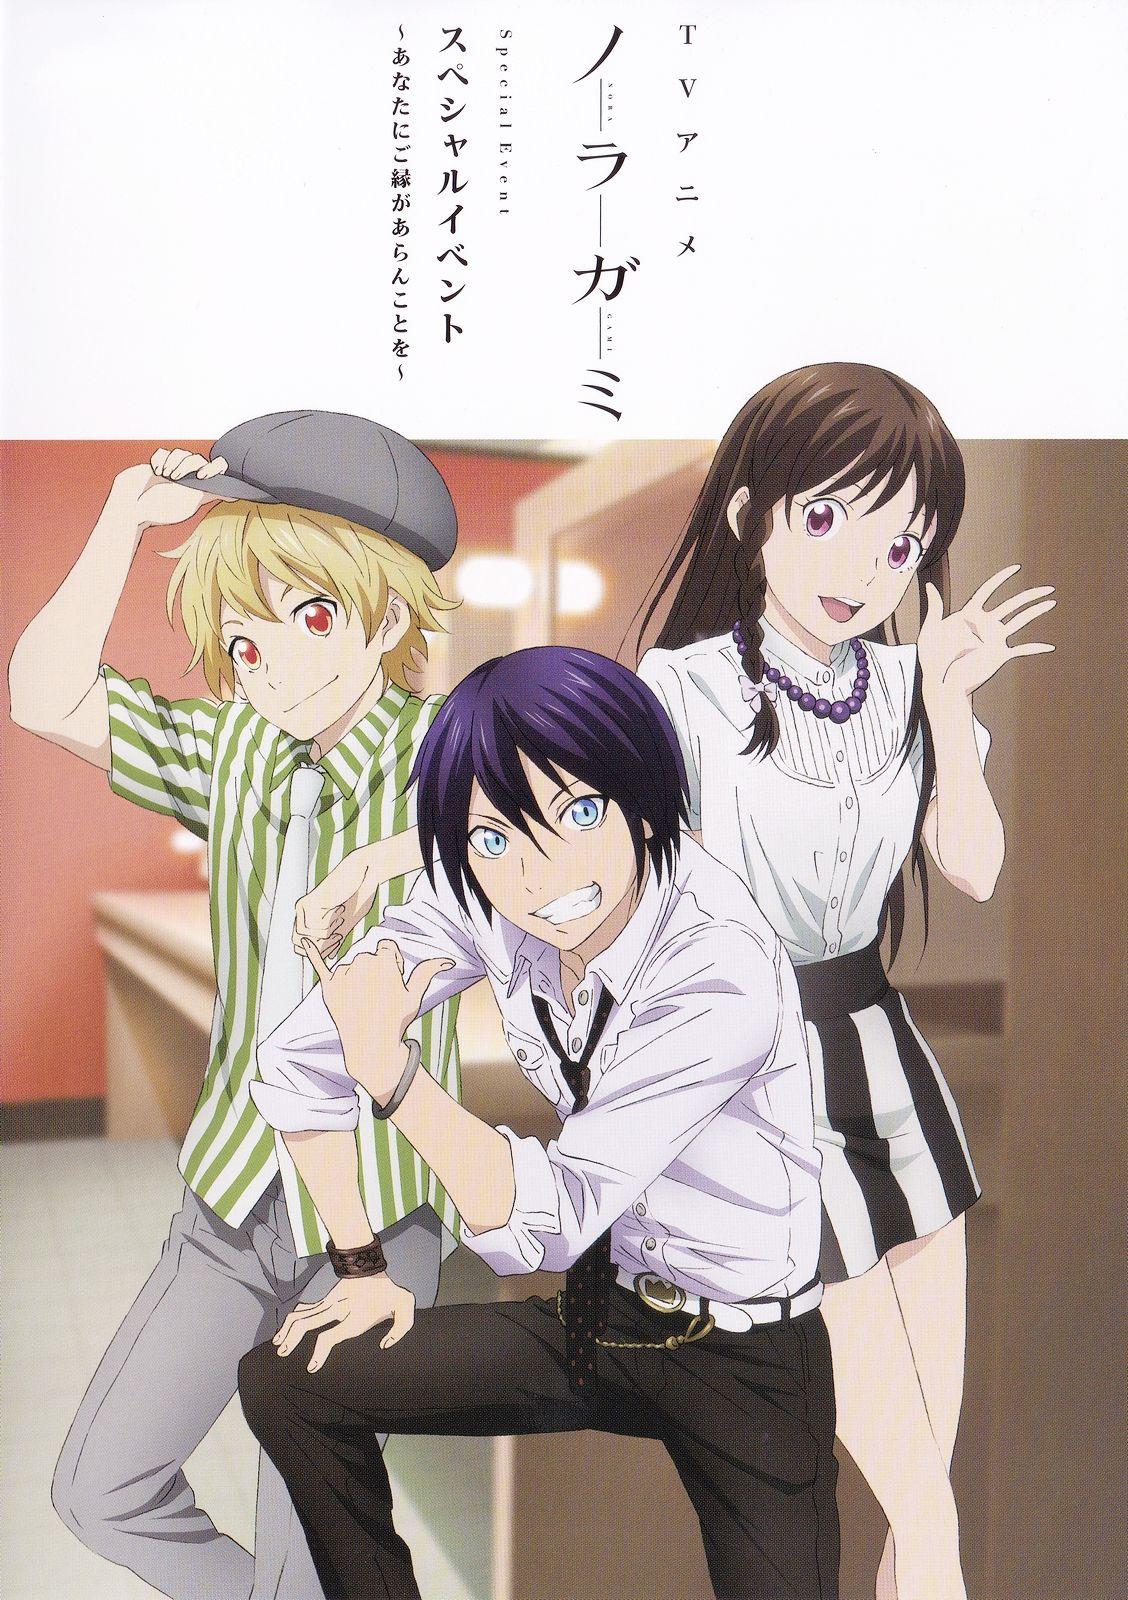 Noragami anime Noragami, Yato noragami, Anime